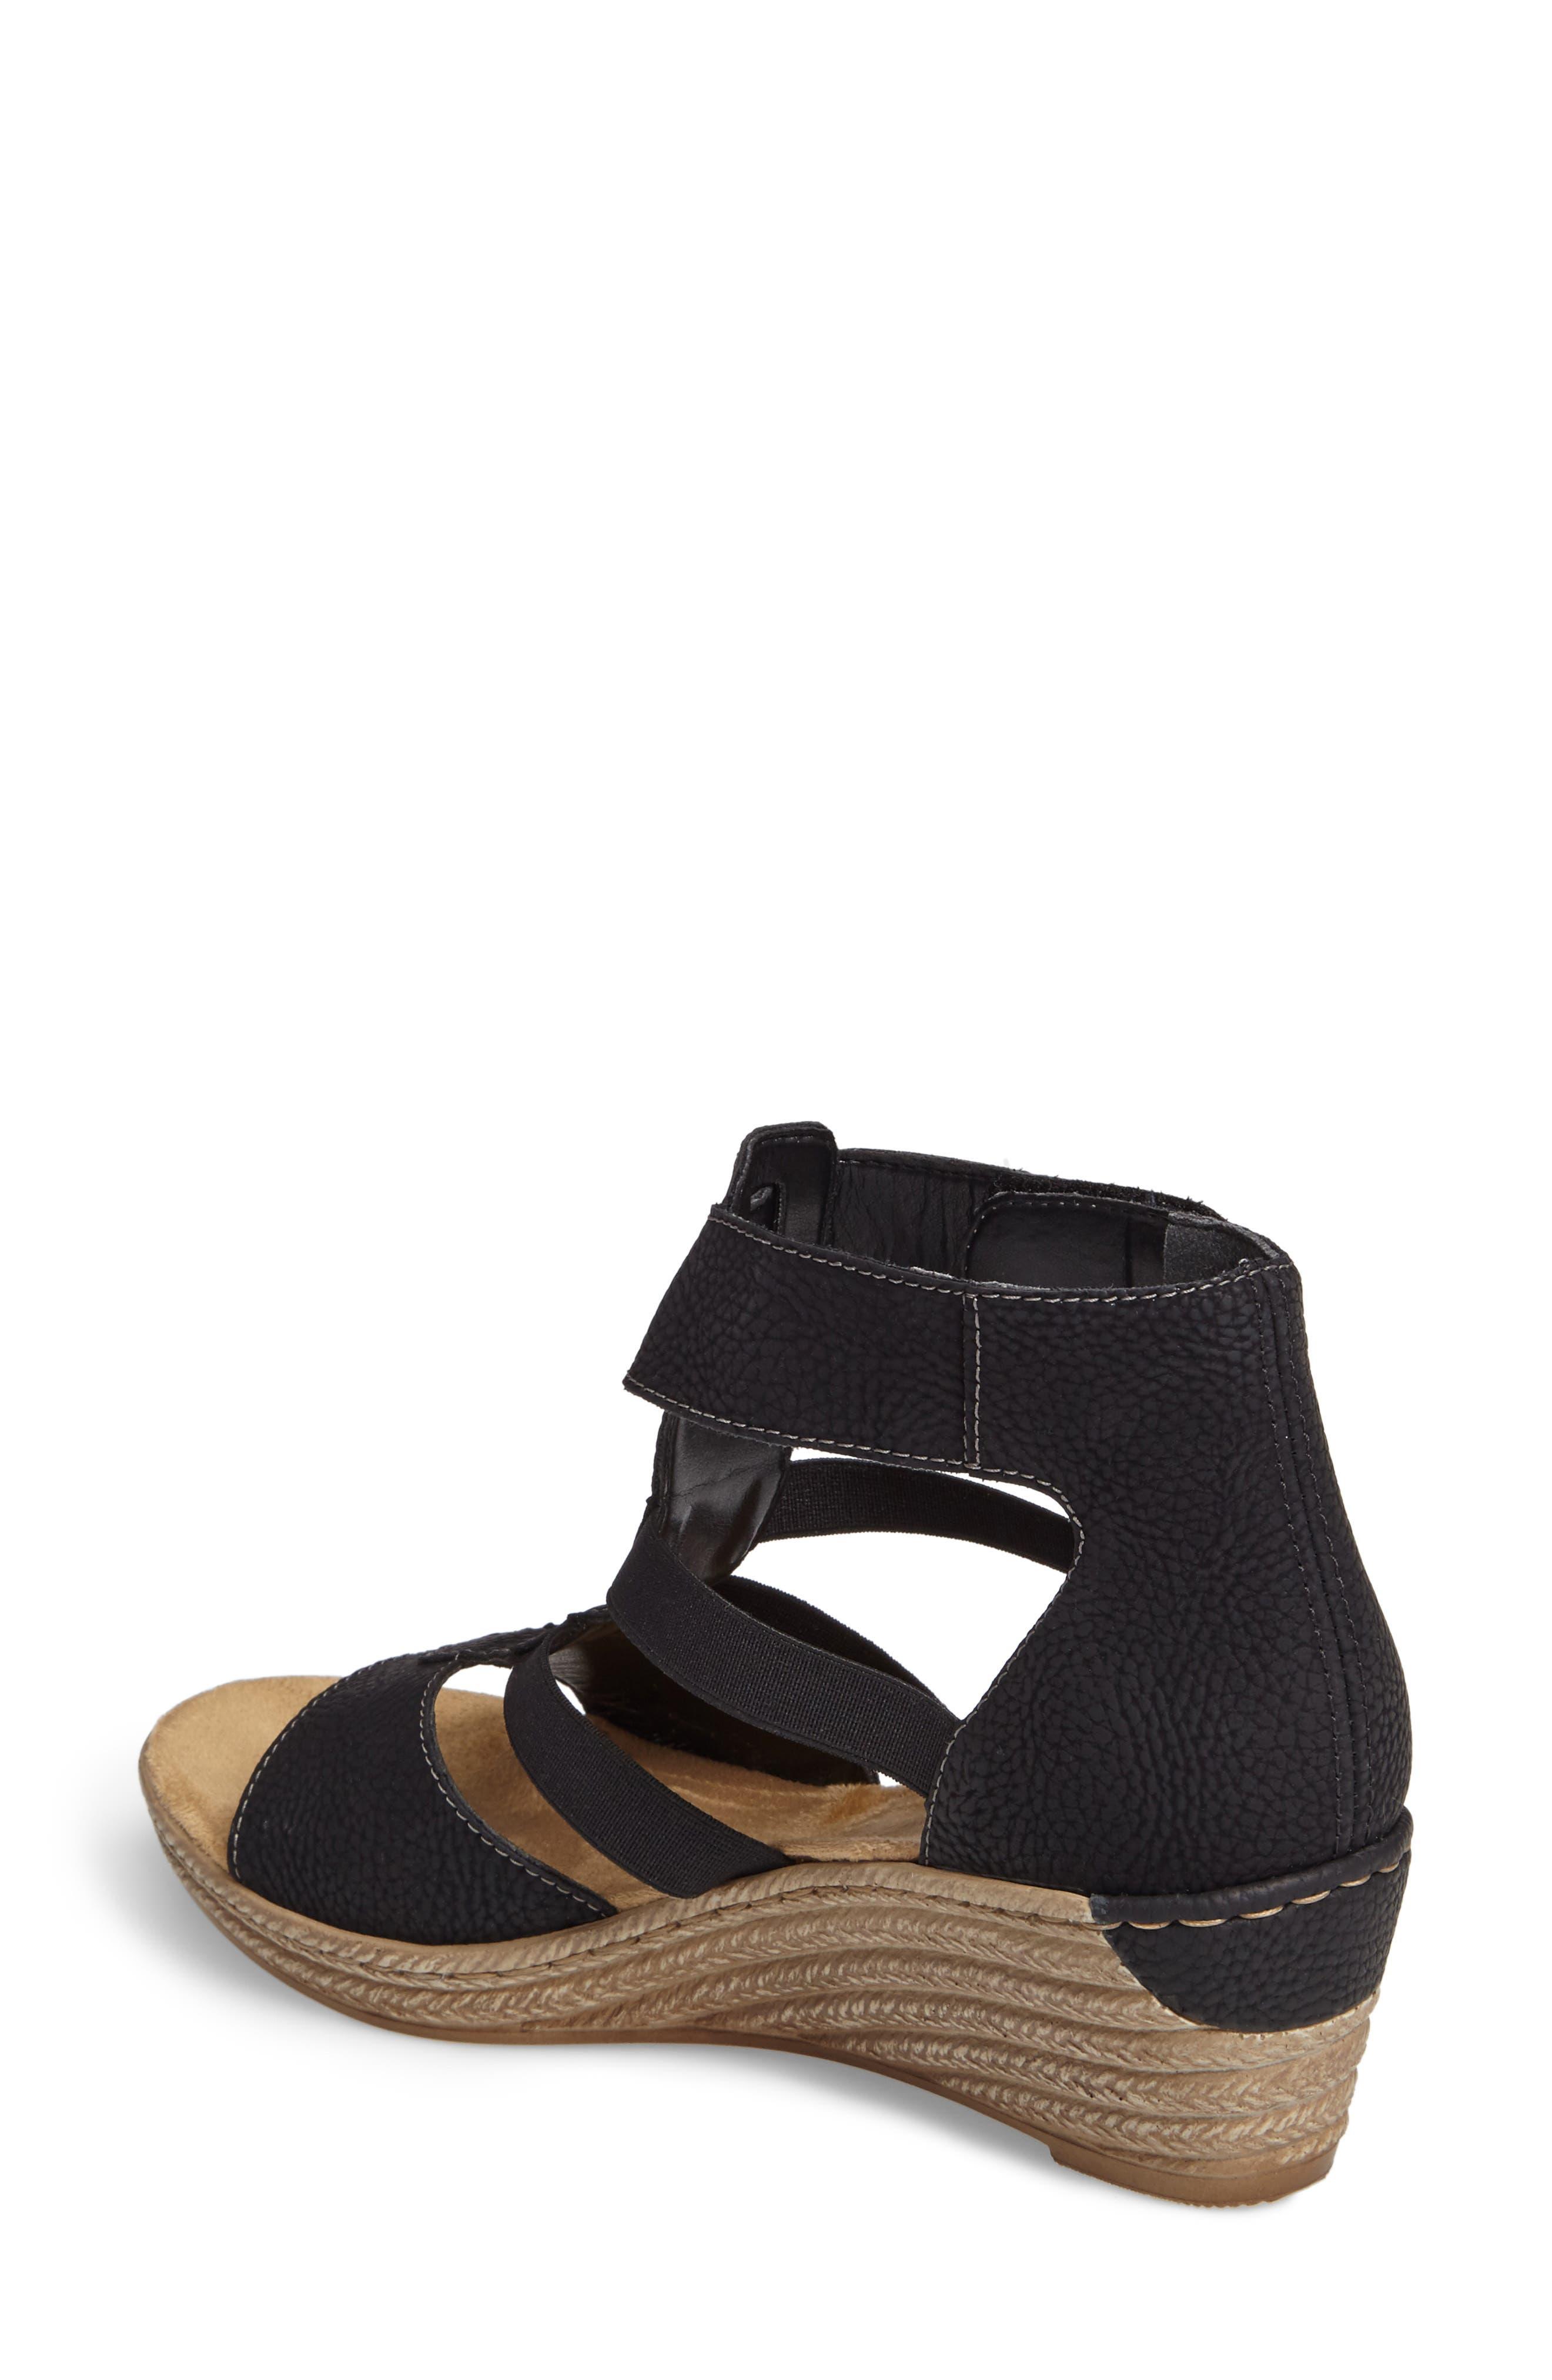 Alternate Image 2  - Rieker Antistress Fanni 39 Wedge Sandal (Women)